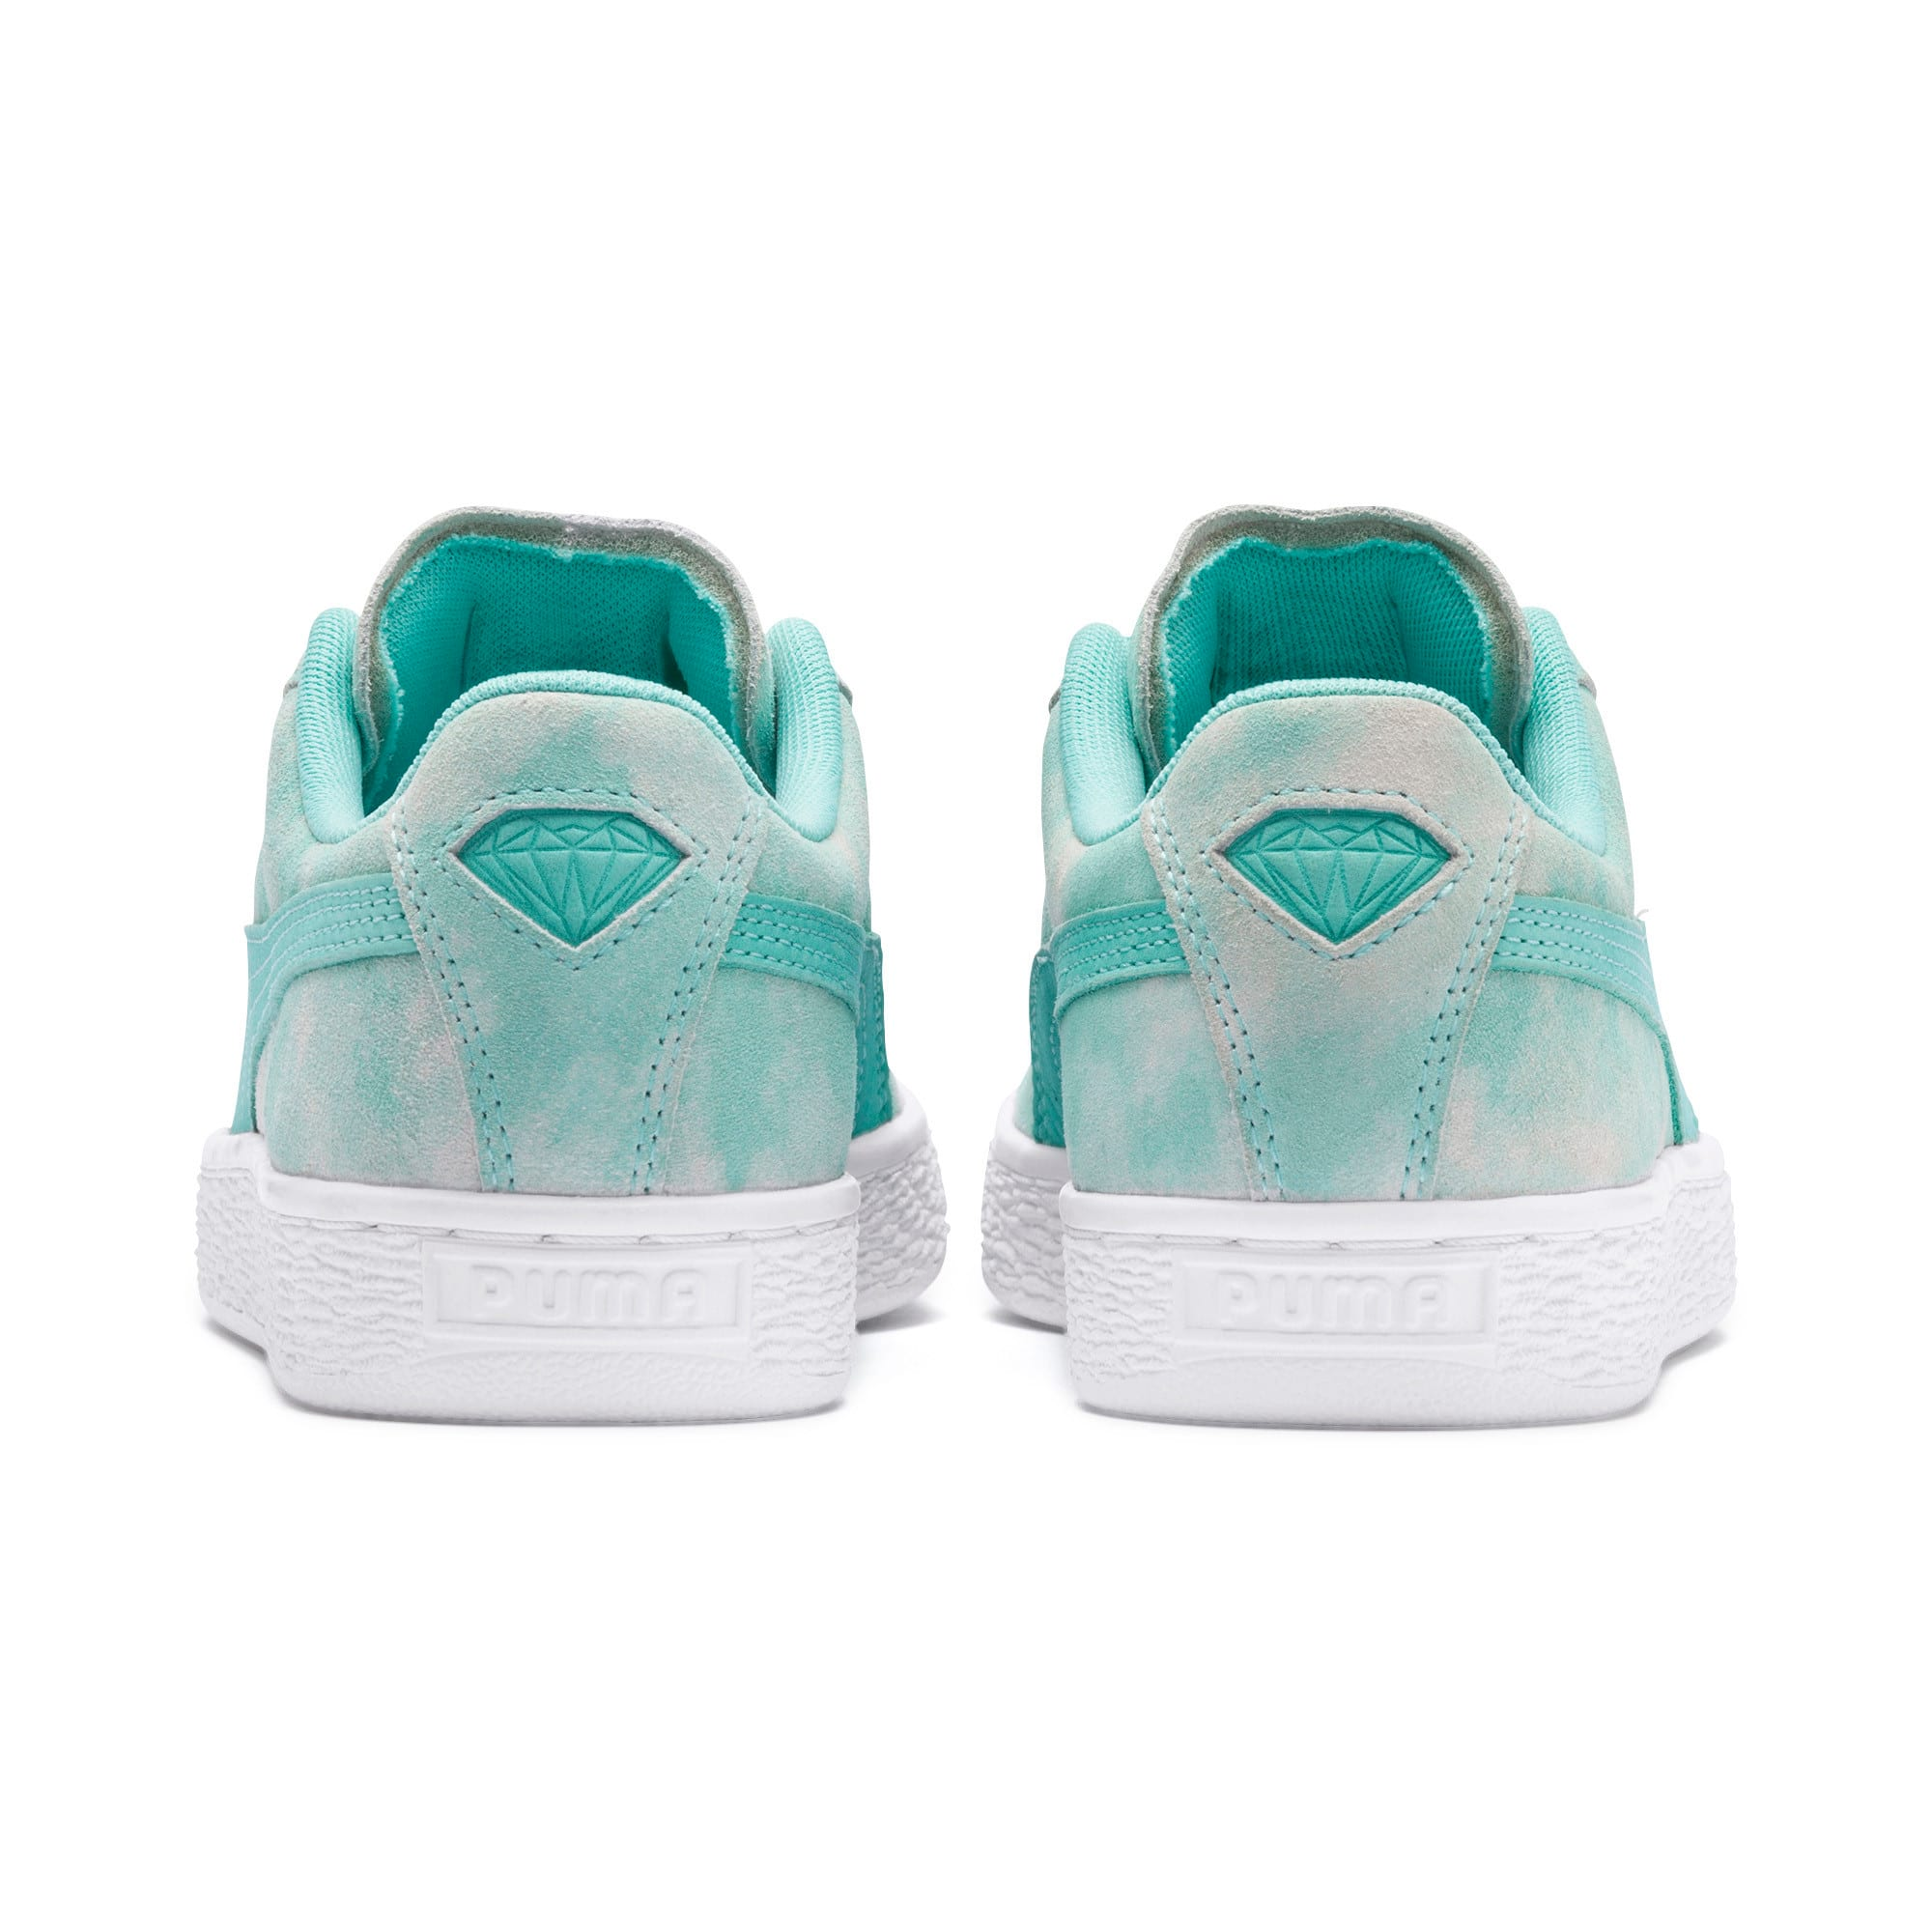 Miniatura 4 de Zapatos deportivosPUMA x DIAMOND SUPPLY CO. Suede JR, Diamond Blue-Diamond Blue, mediano